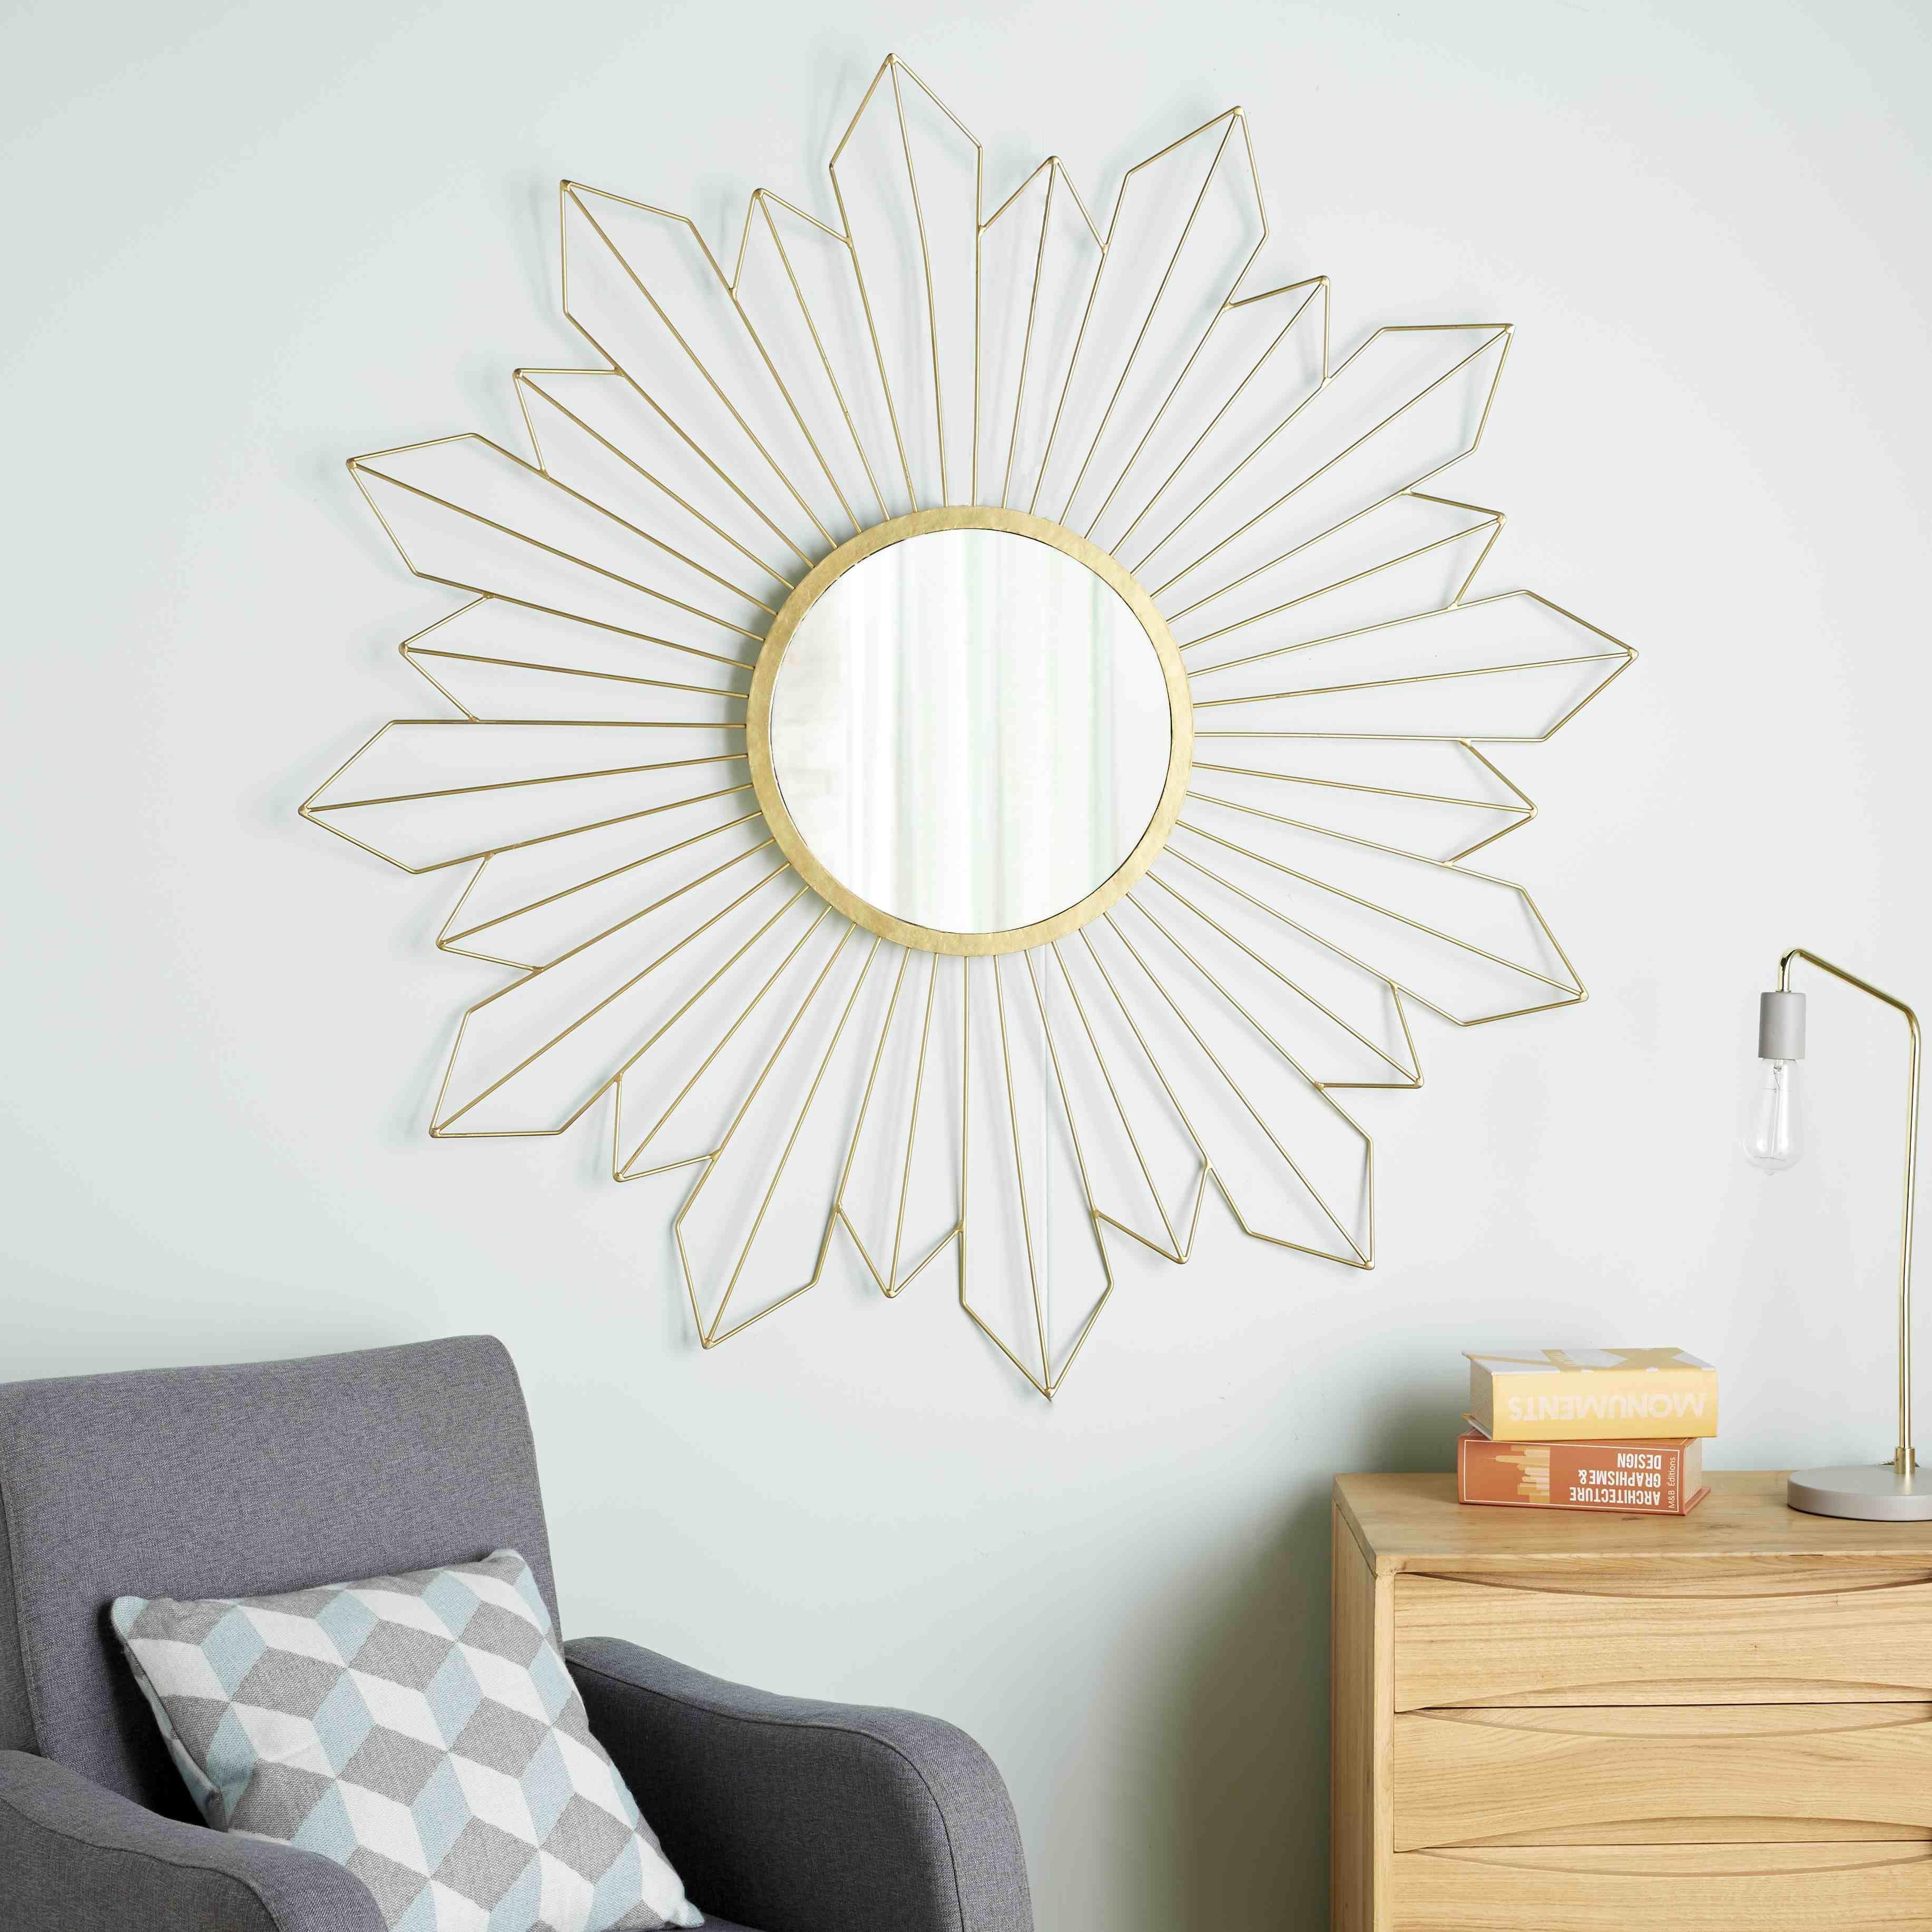 miroir en fil de m tal dor vega deco objets. Black Bedroom Furniture Sets. Home Design Ideas